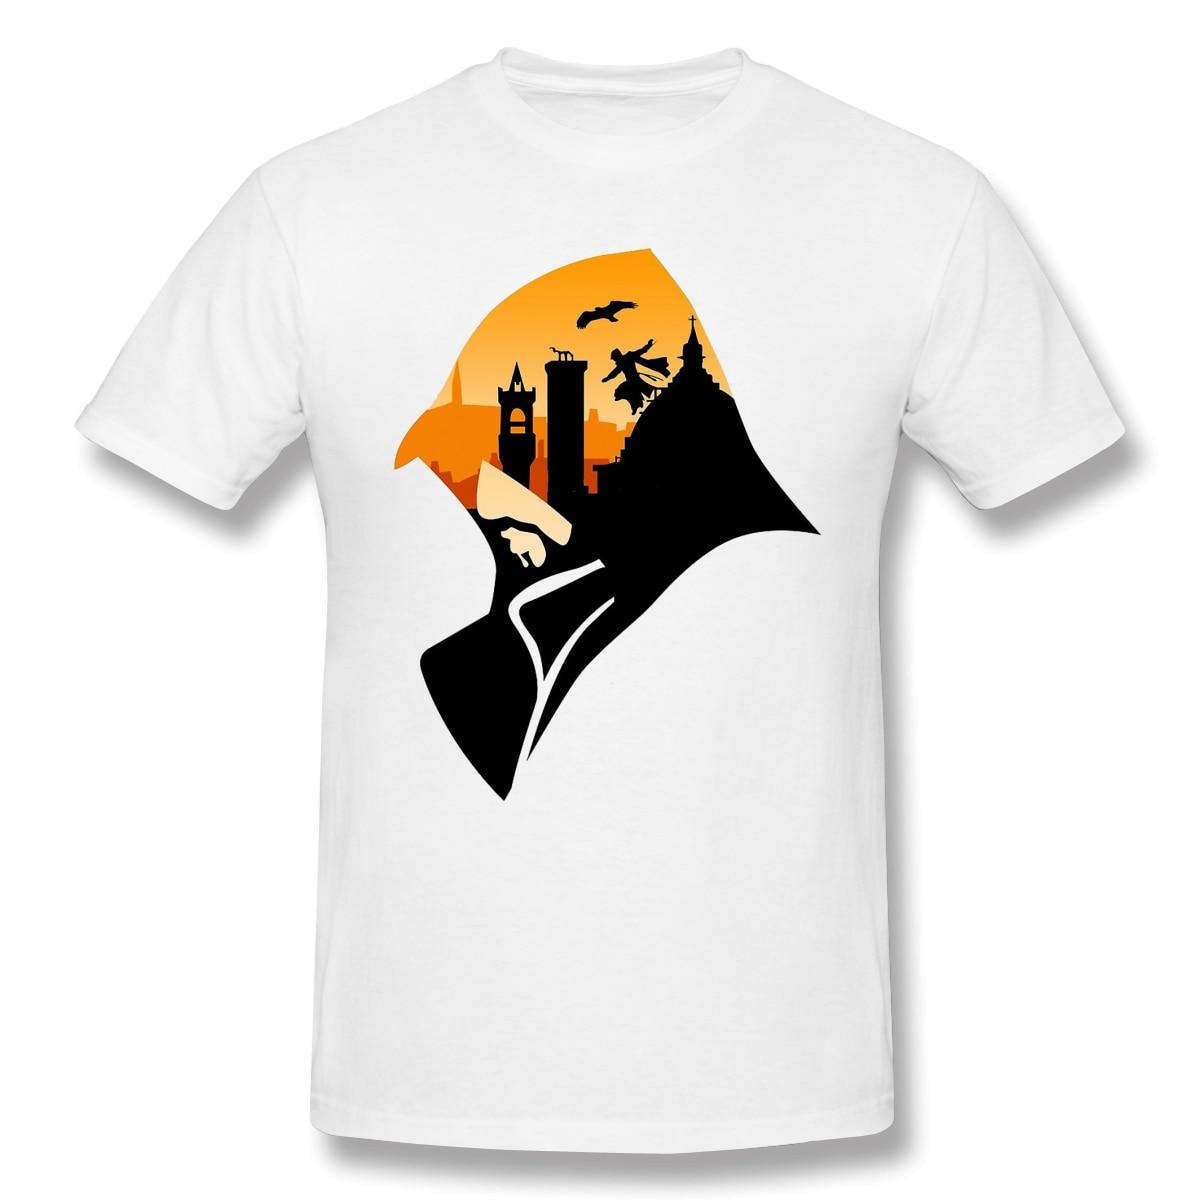 Camiseta básica con estampado de atardecer en Florencia para hombre, camiseta con diseño divertido de assassins creed, ropa de calle estampada para hombre, Top envío gratis